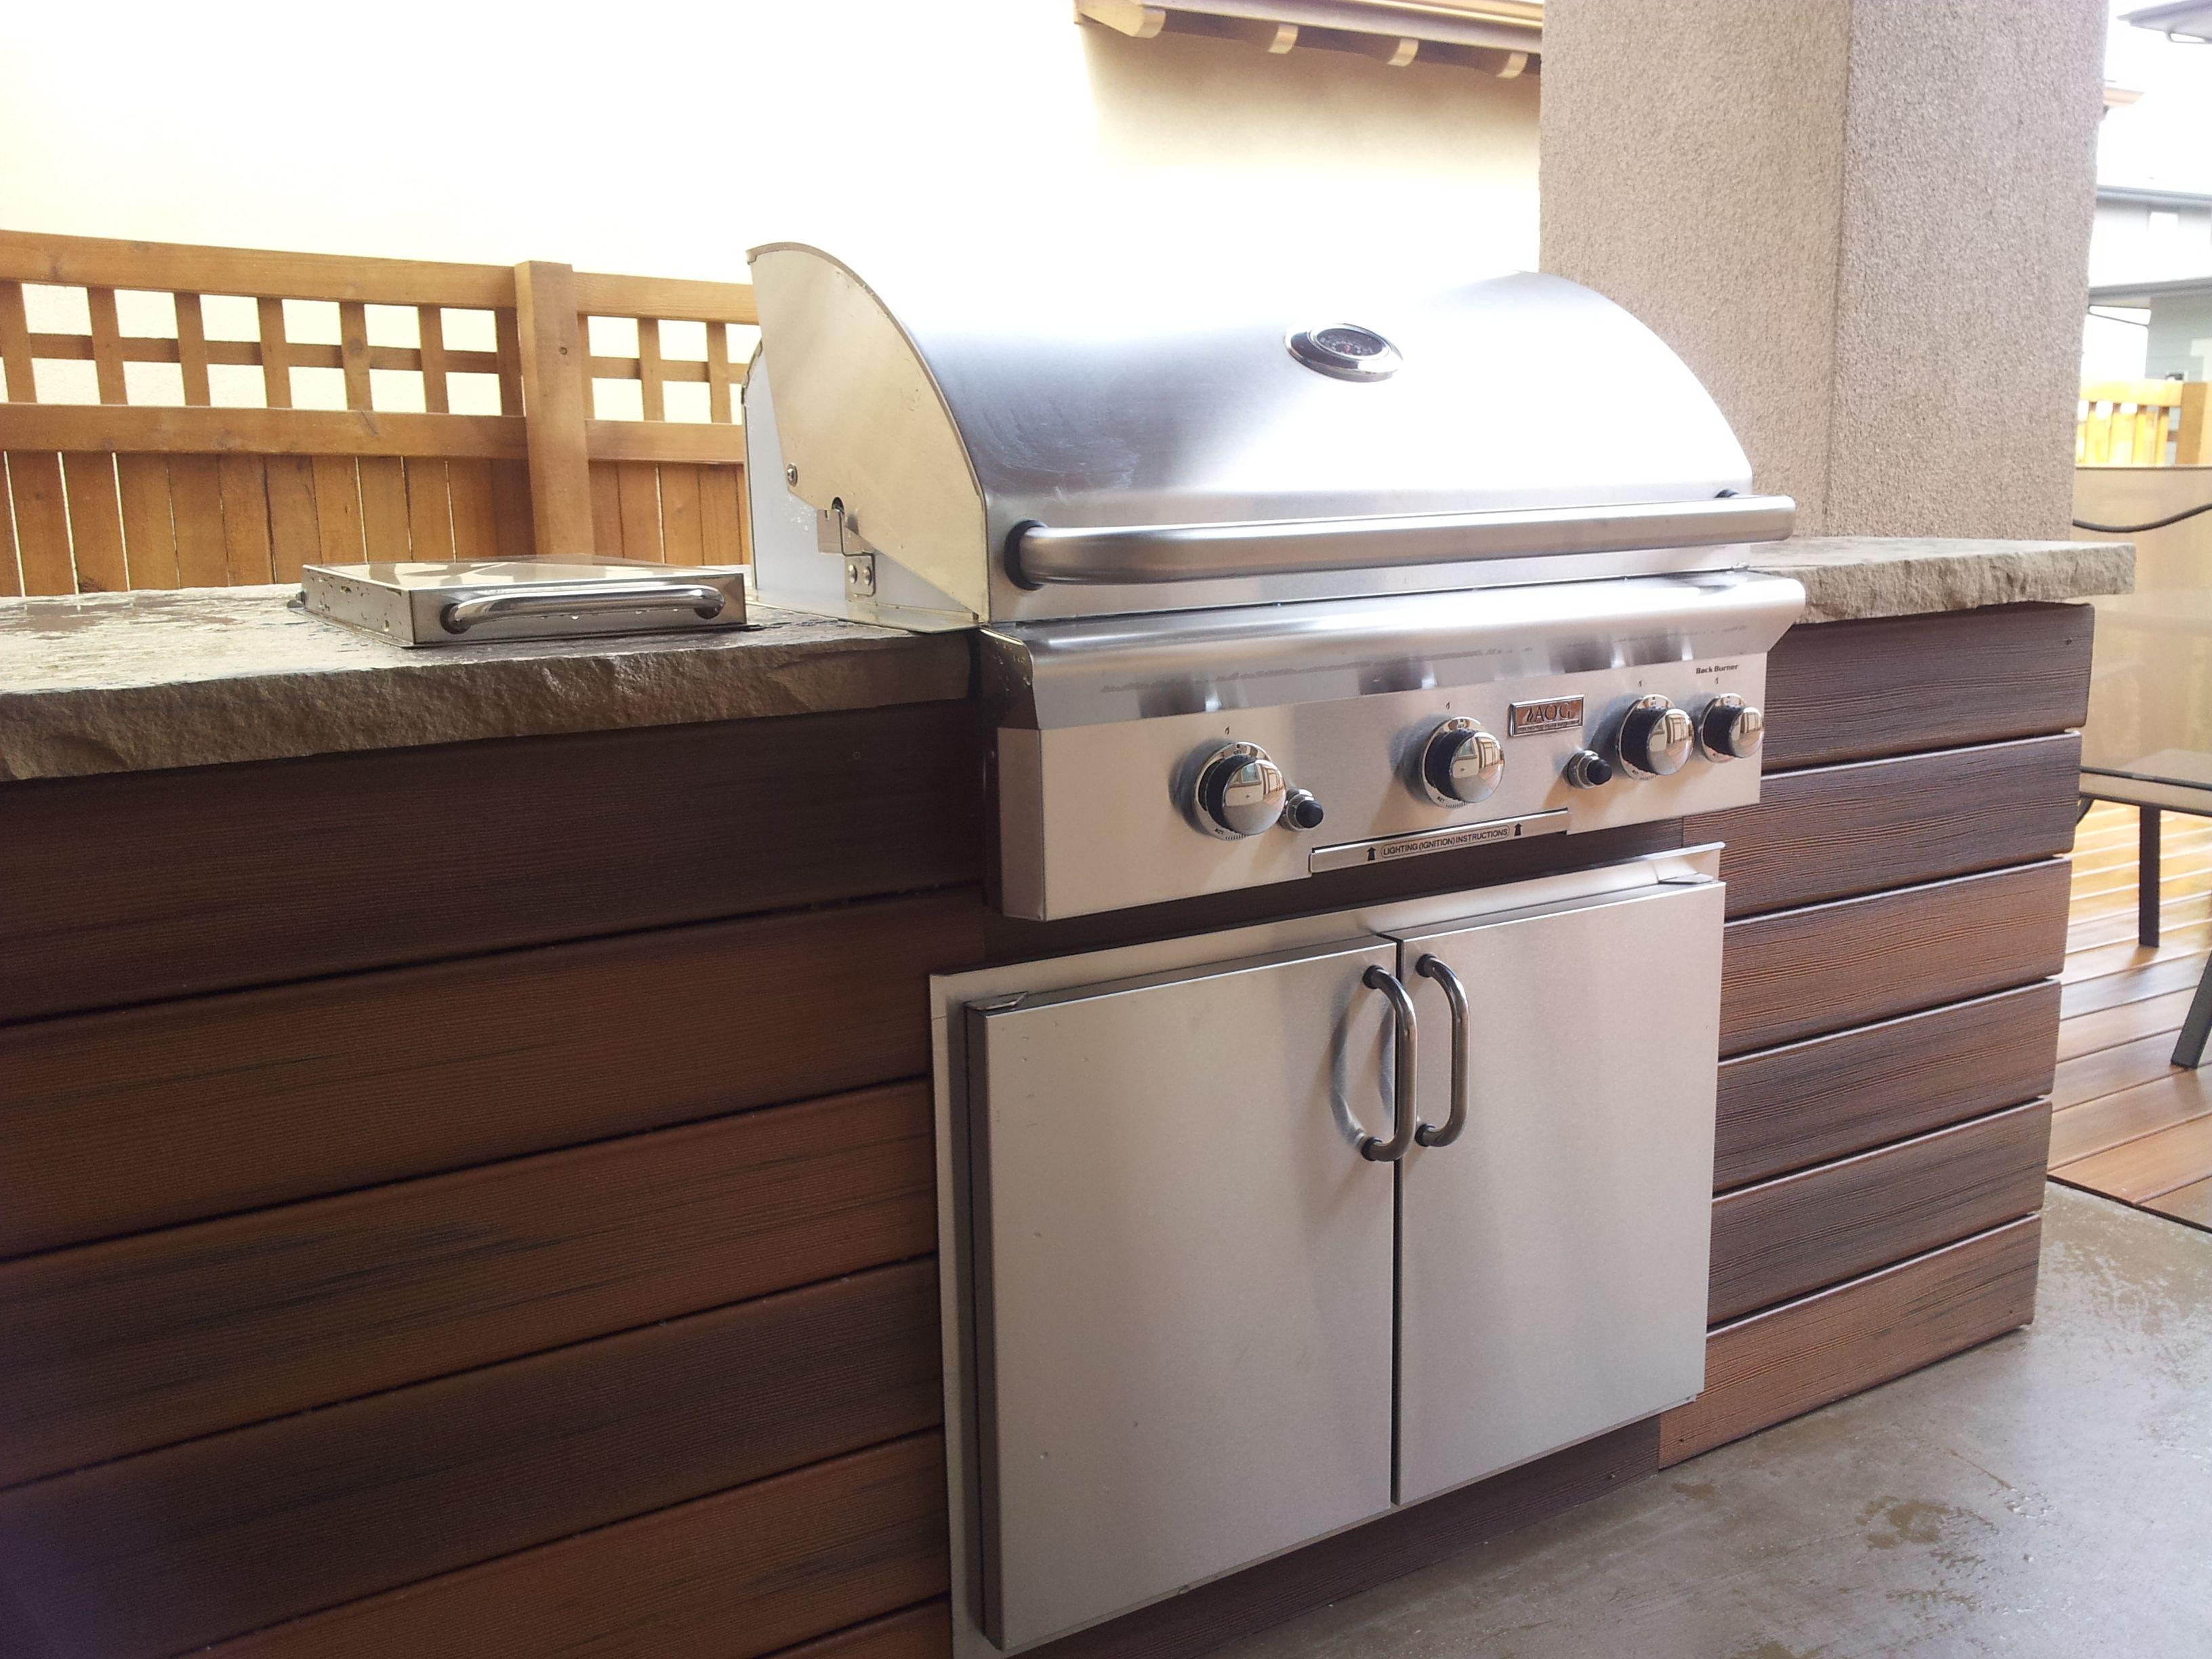 Best Kitchen Gallery: Posite Wood Slats Buff Flagstone Countertop Outdoor Kitchen of Composite Wood Kitchen Cabinets on rachelxblog.com